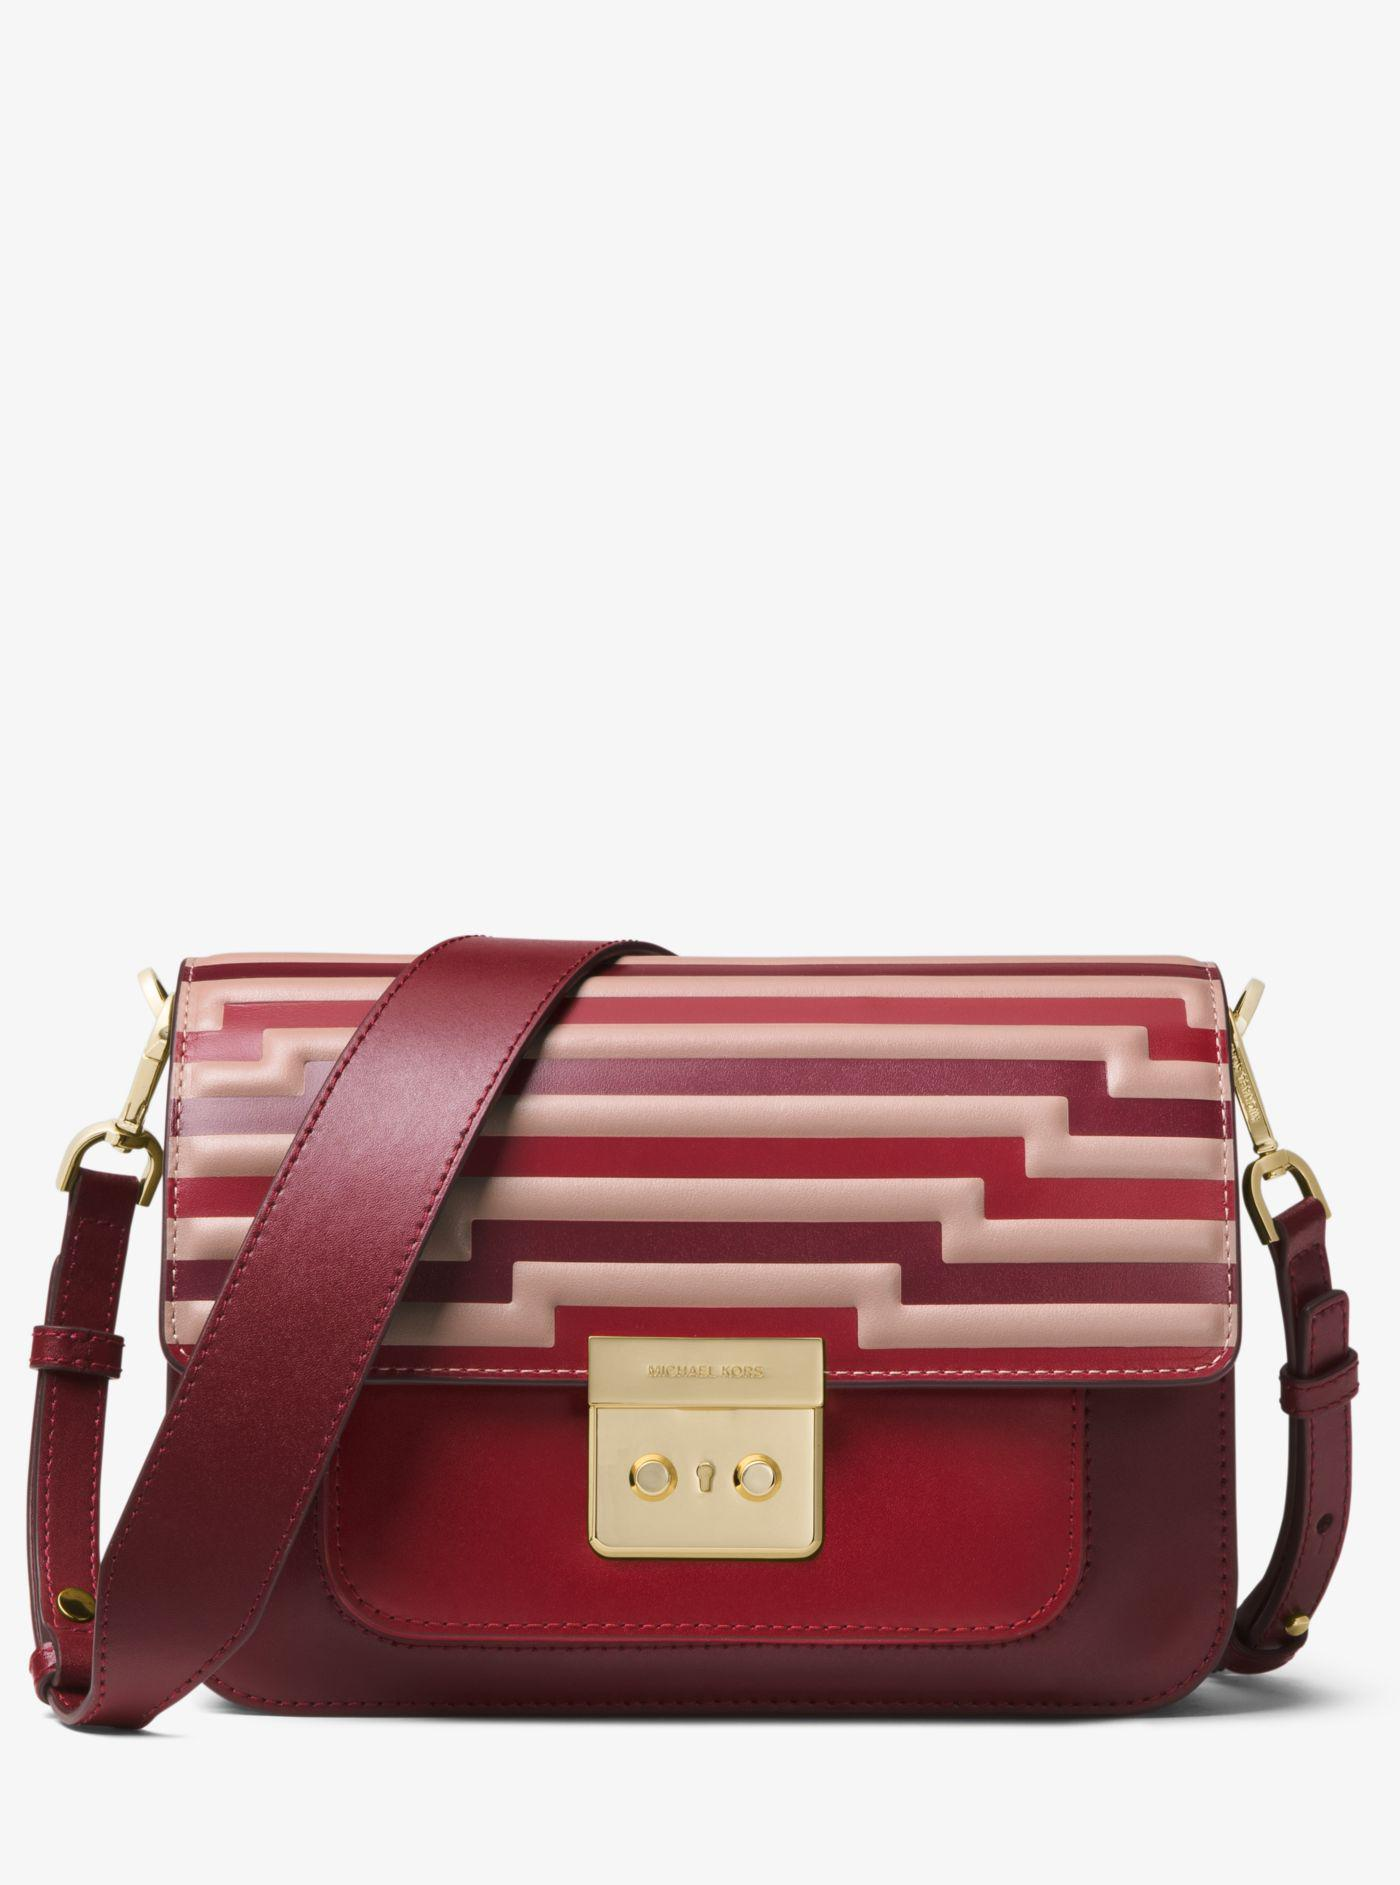 e48c5166d5cf Lyst - Michael Kors Sloan Editor Tri-color Leather Shoulder Bag in Red